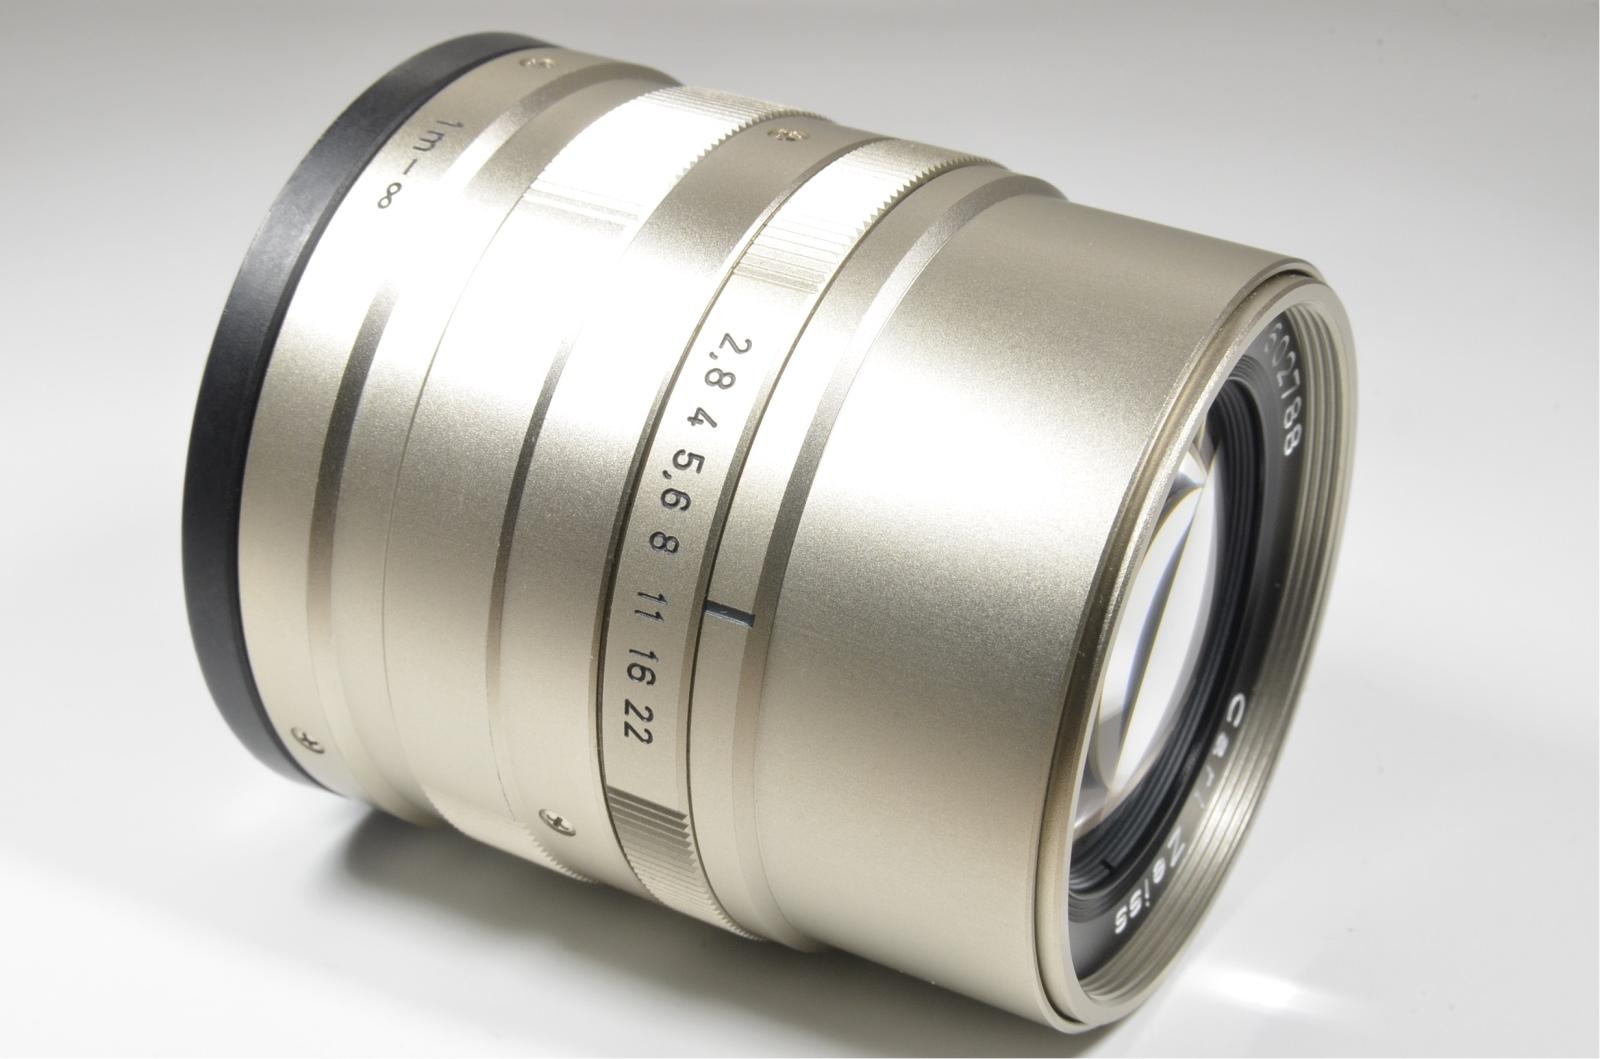 contax g2 with half case, planar 45mm, biogon 28mm, sonnar 90mm and tla200